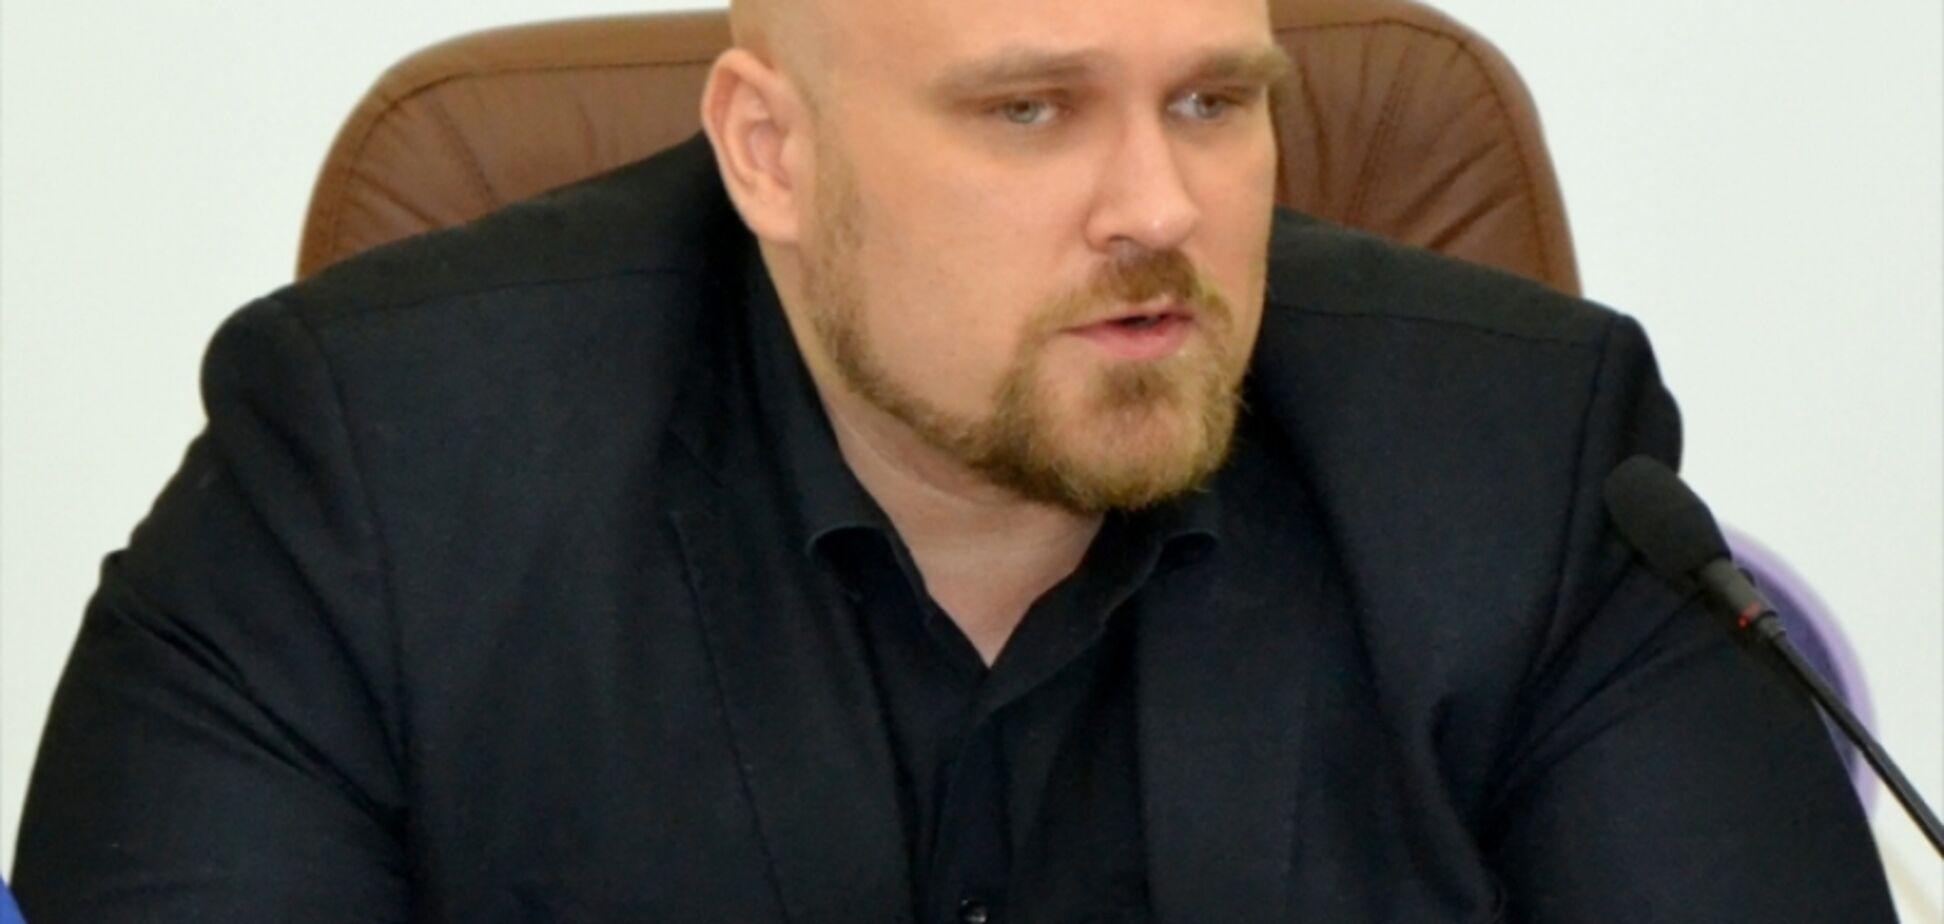 ''Знаю точно'': экс-главарь ''ДНР'' назвал организатора убийства Захарченко